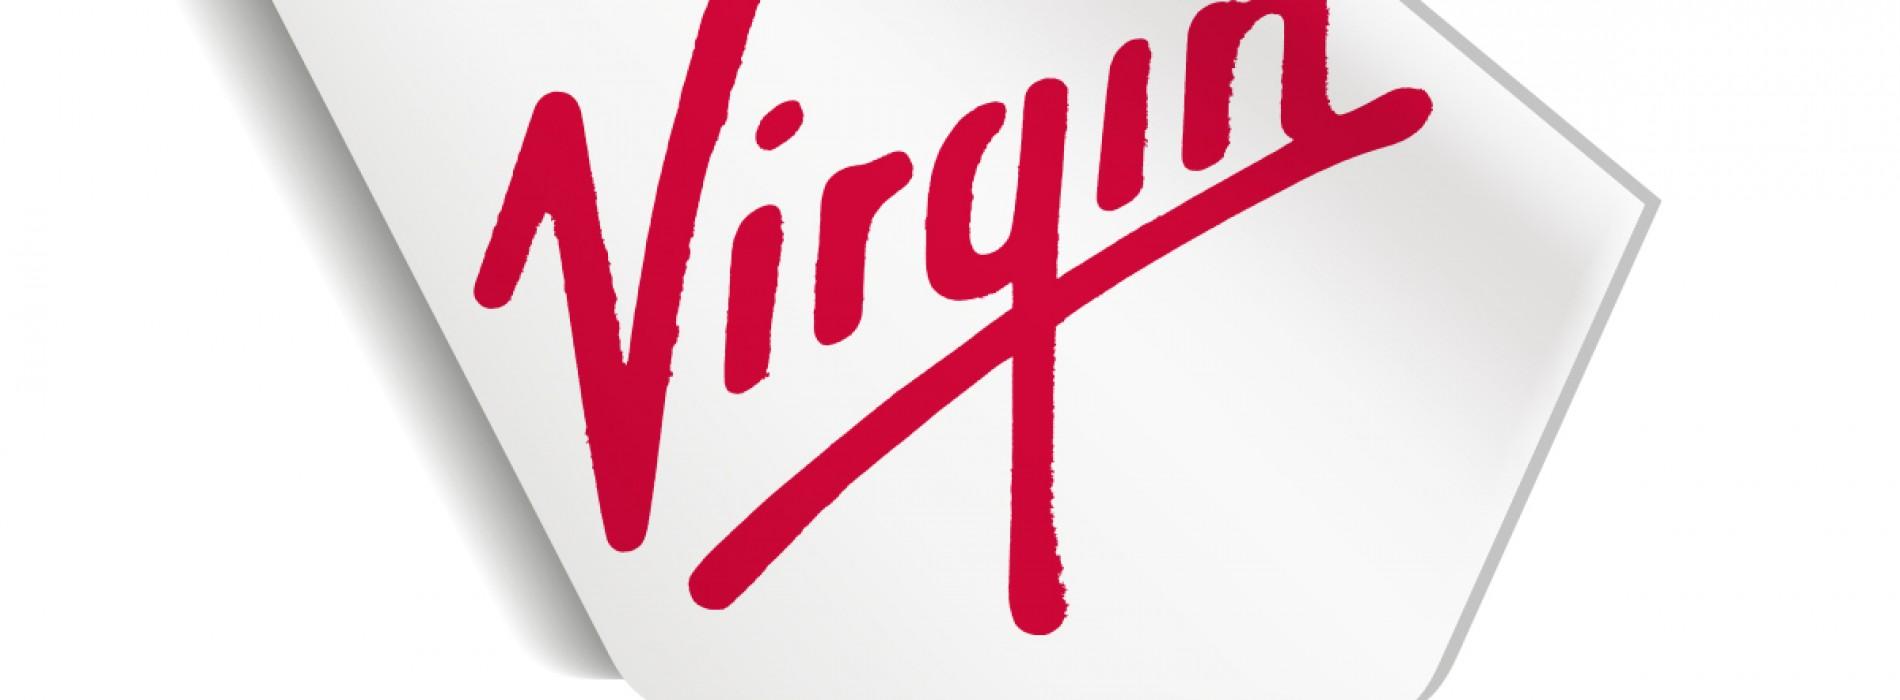 Virgin Australia and Sabre expand partnership